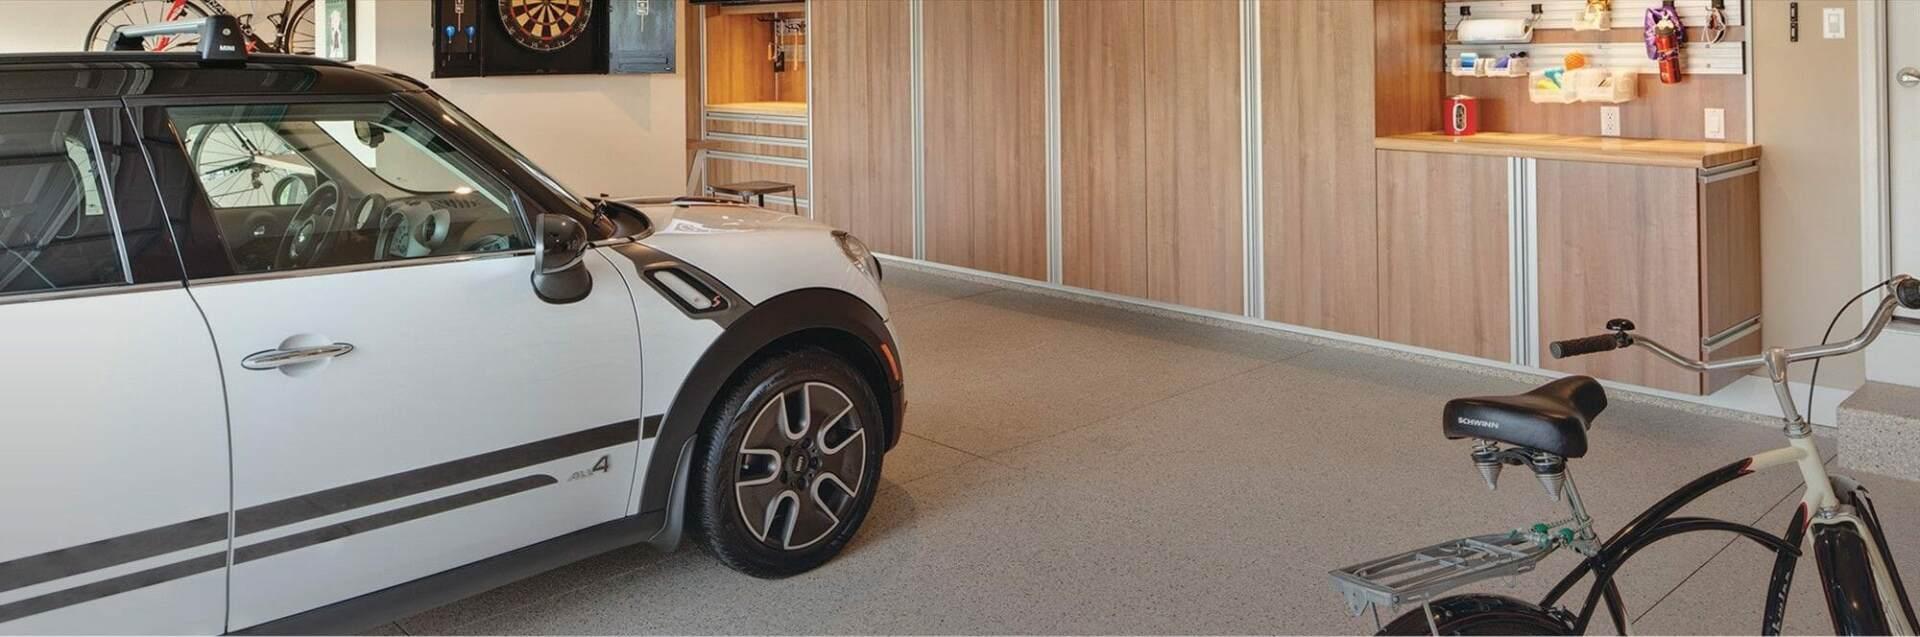 Polyaspartic Epoxy Coatings for Garage Floors